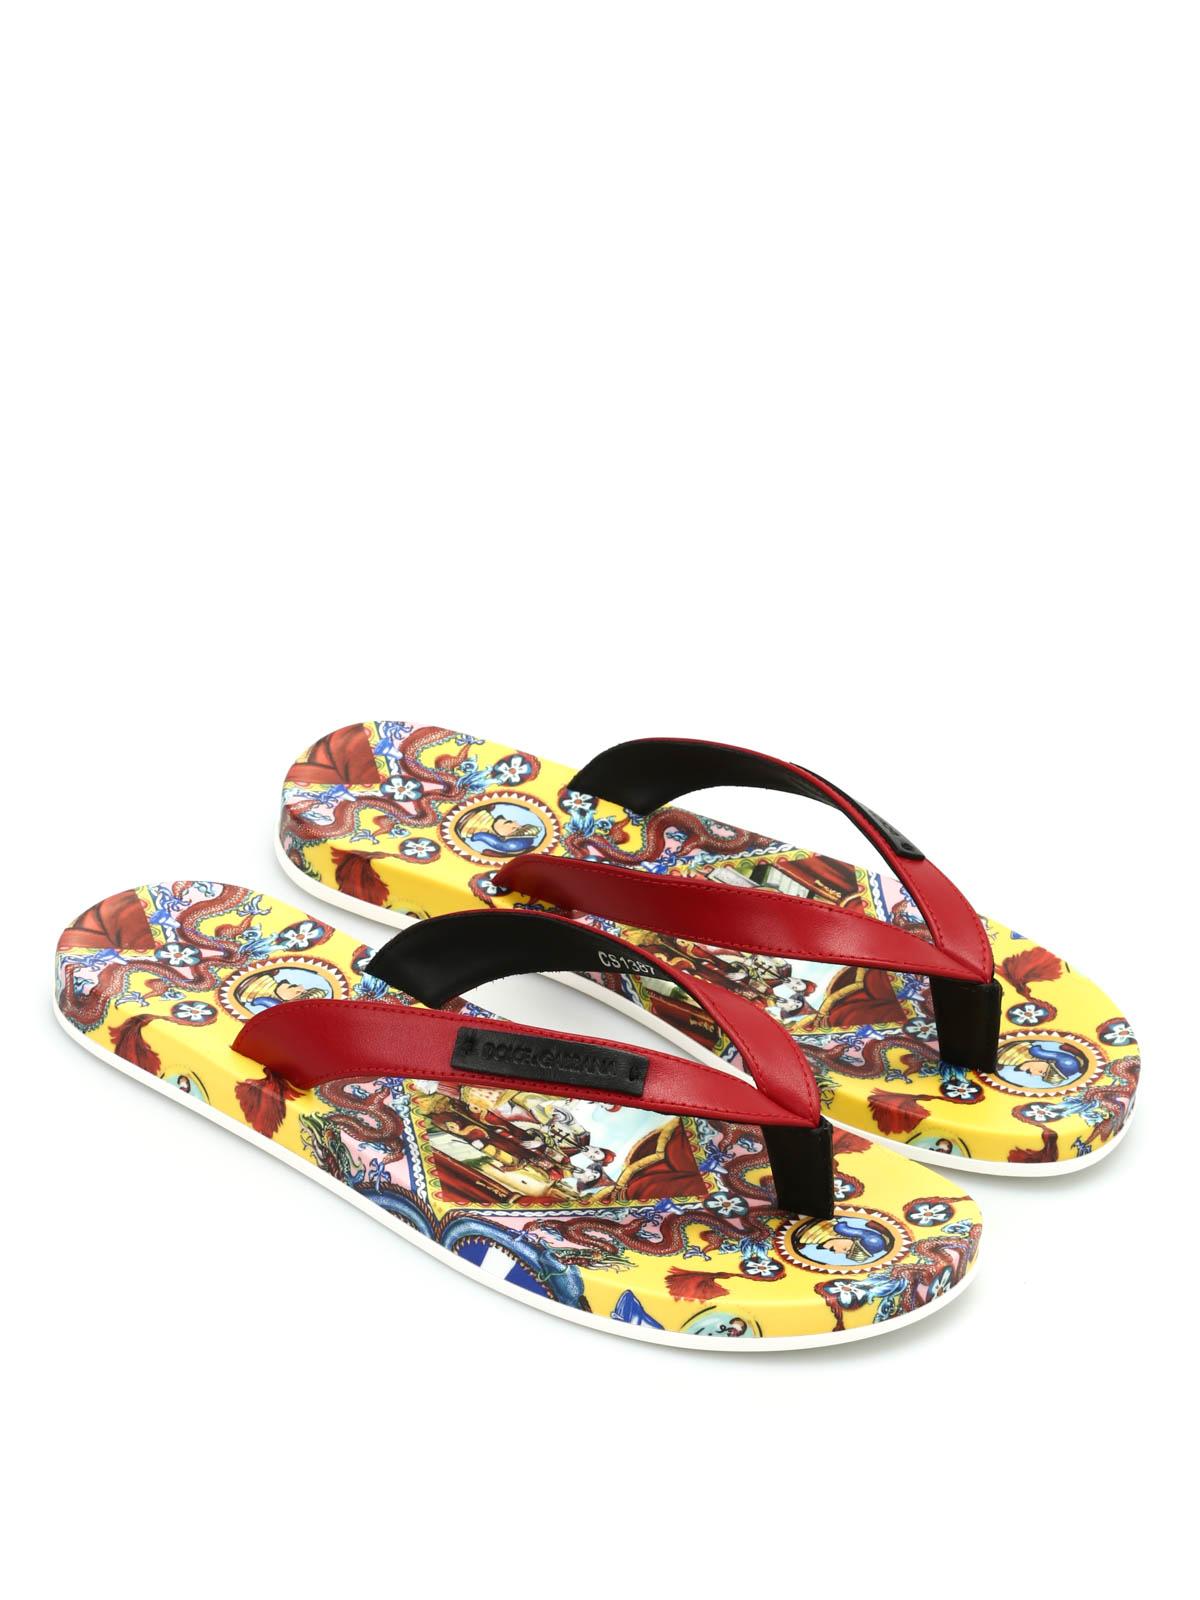 572217f6031 Dolce   Gabbana - Chinese print flip flops - flip flops ...